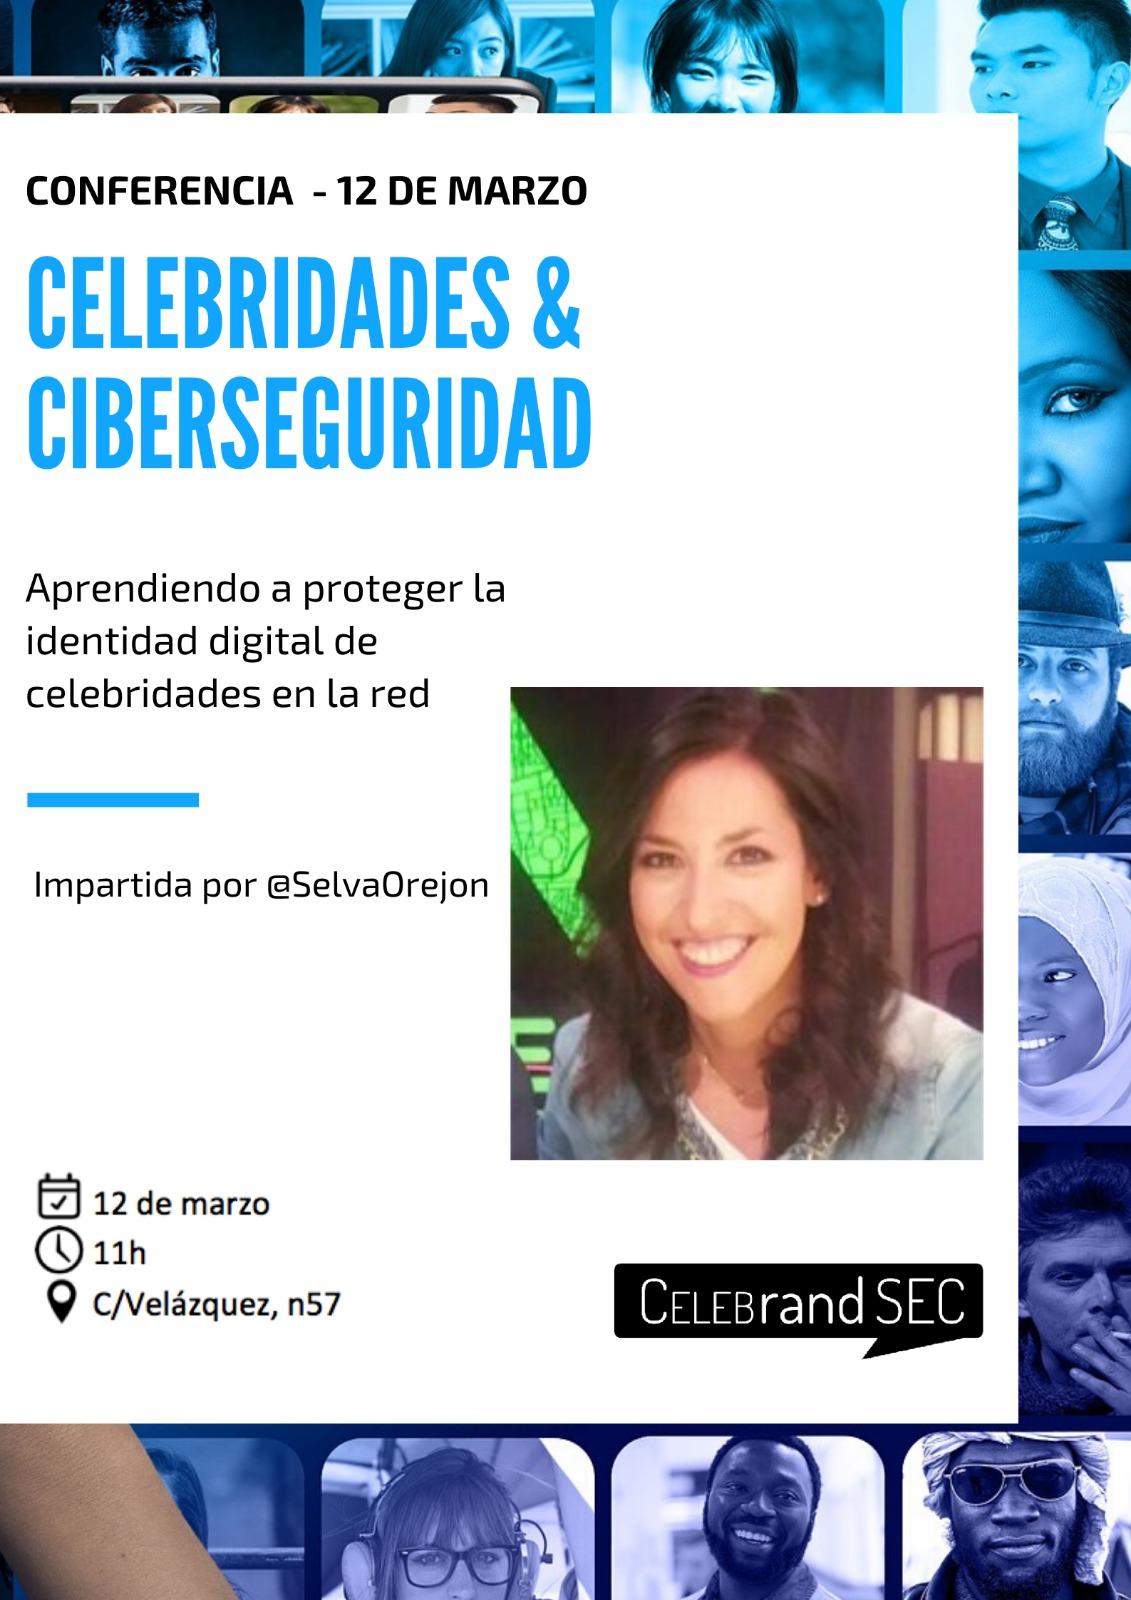 Celebridades & Ciberseguridad - Selva Orejón